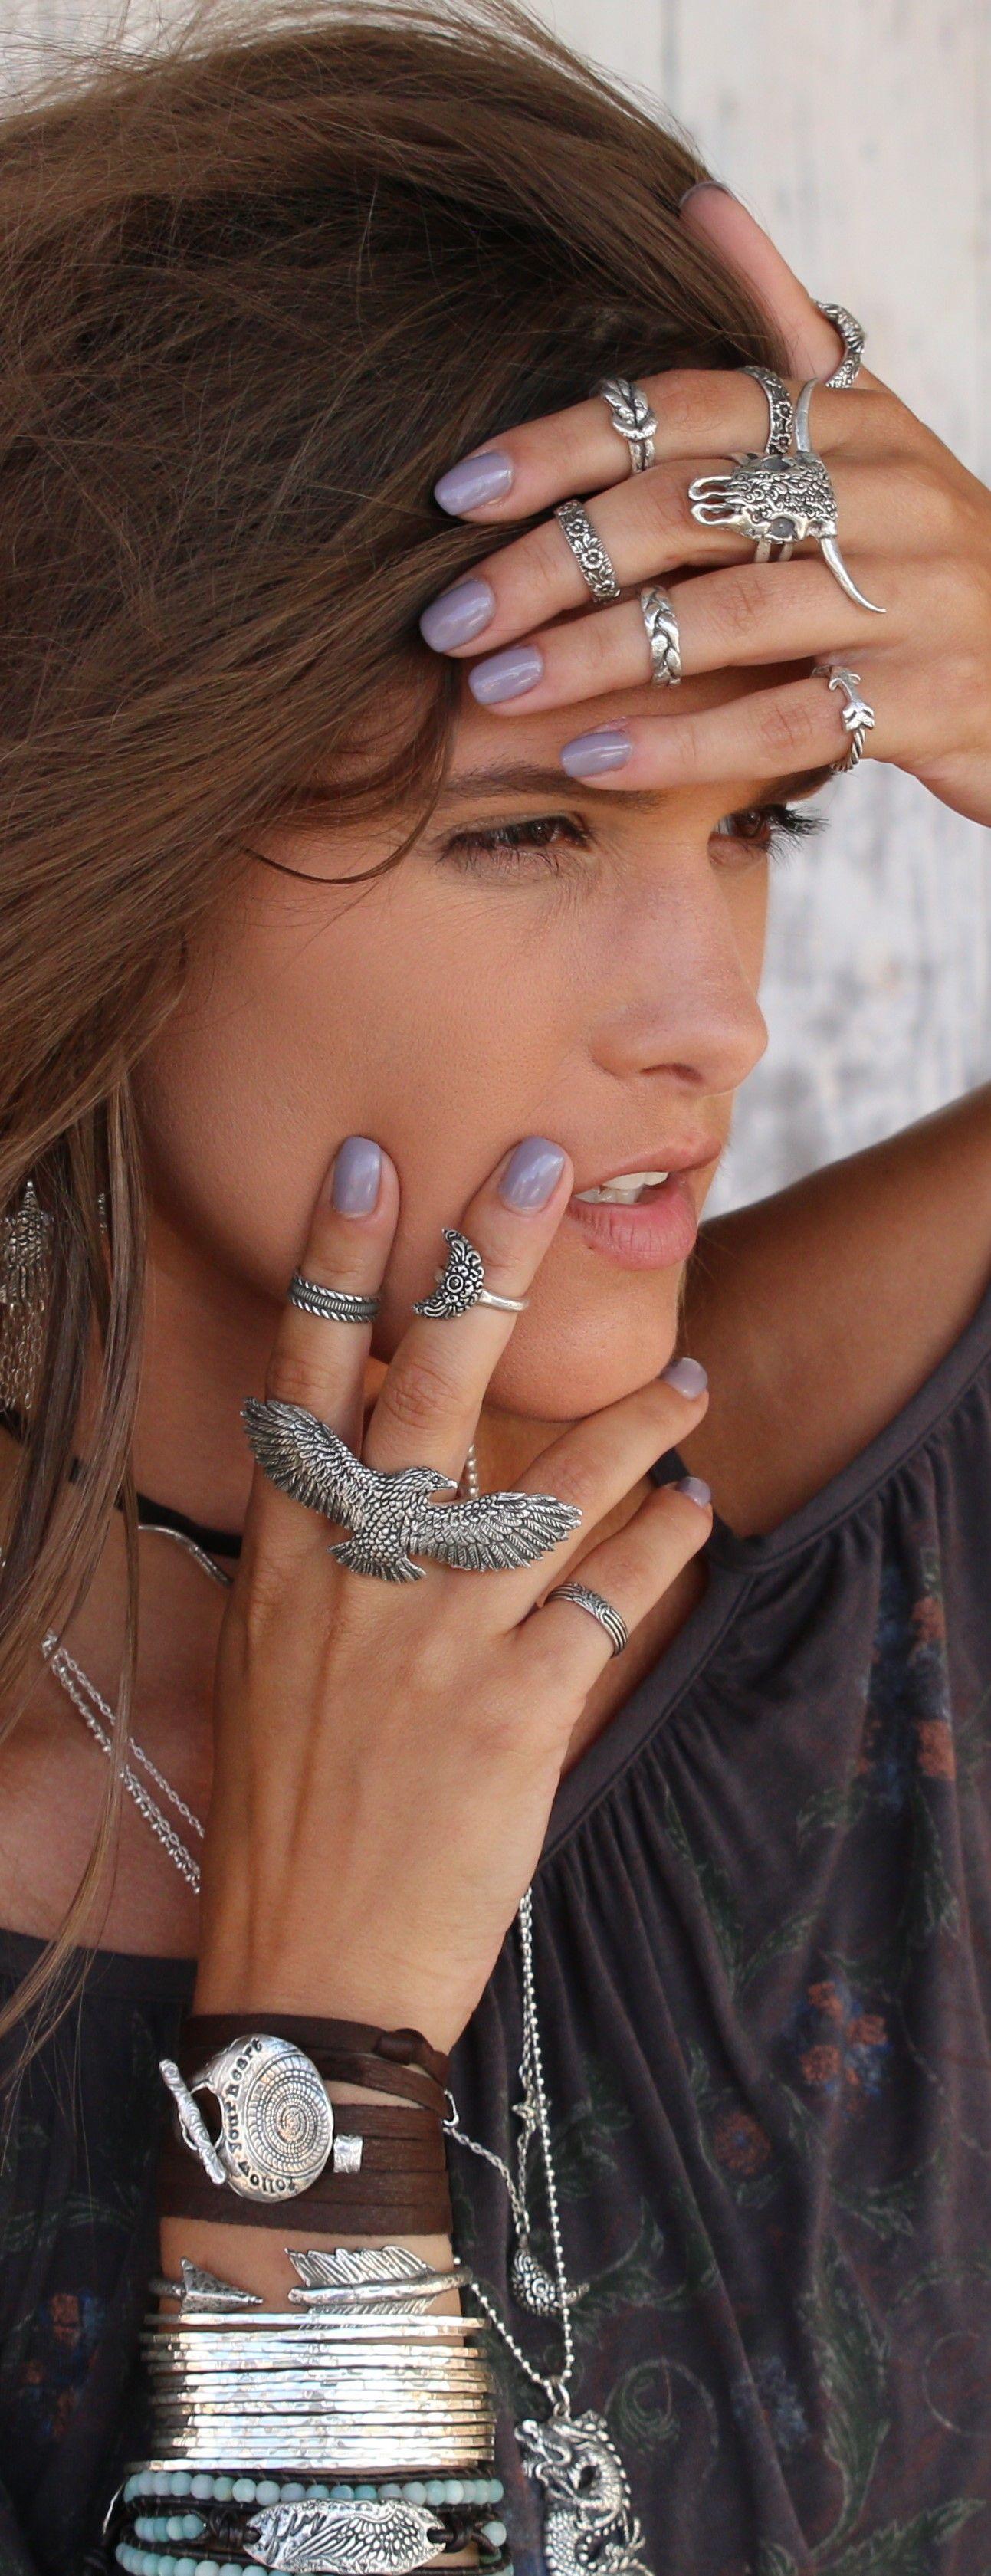 Boho Jewelry Boho Ring Silver Boho Ring Boho Silver Rings Etsy Boho Jewelry Boho Rings Silver Multi Finger Rings